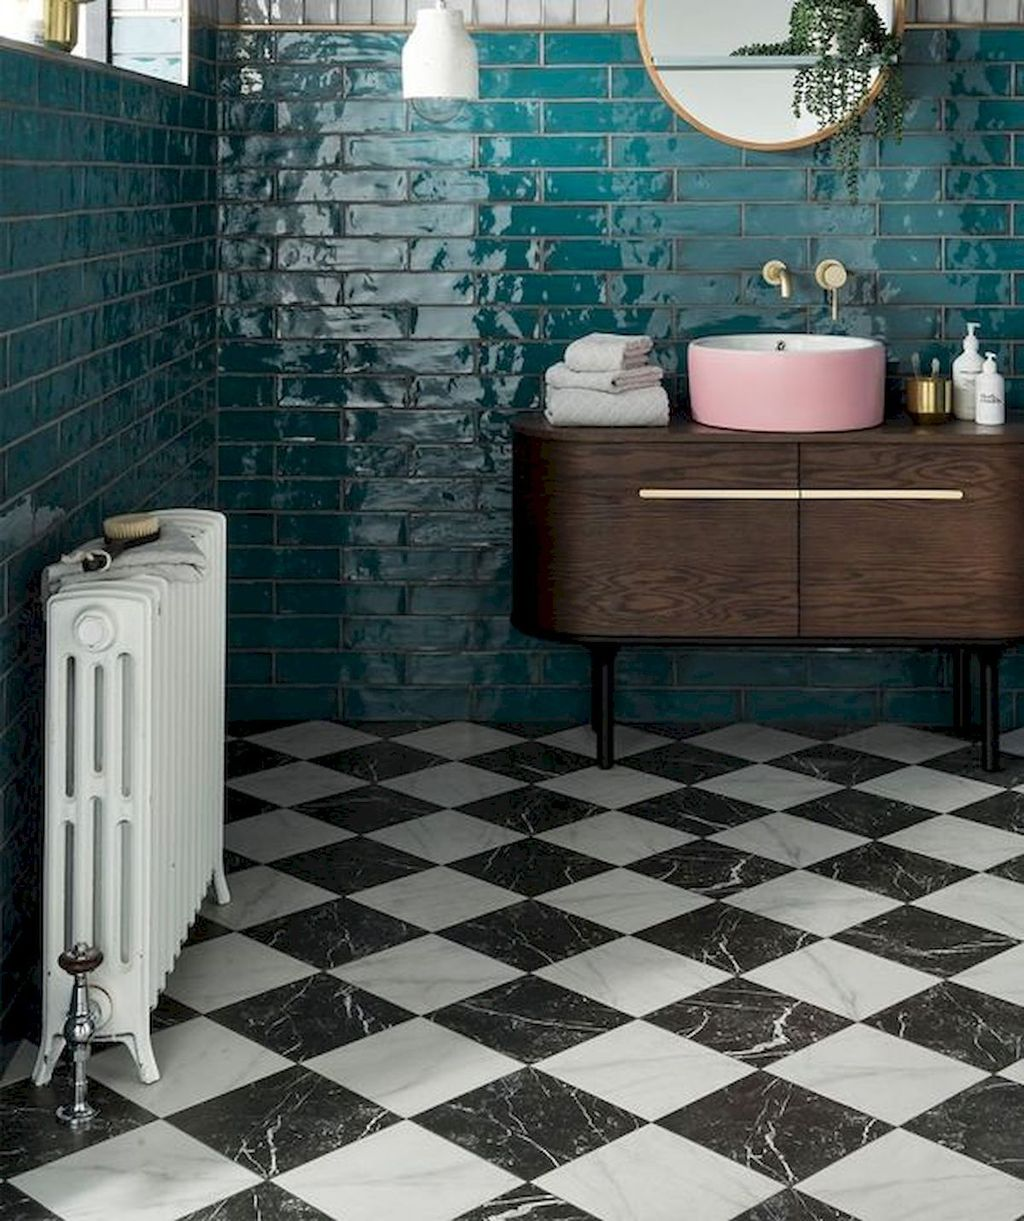 Inspiring Bathroom Tile Ideas 18